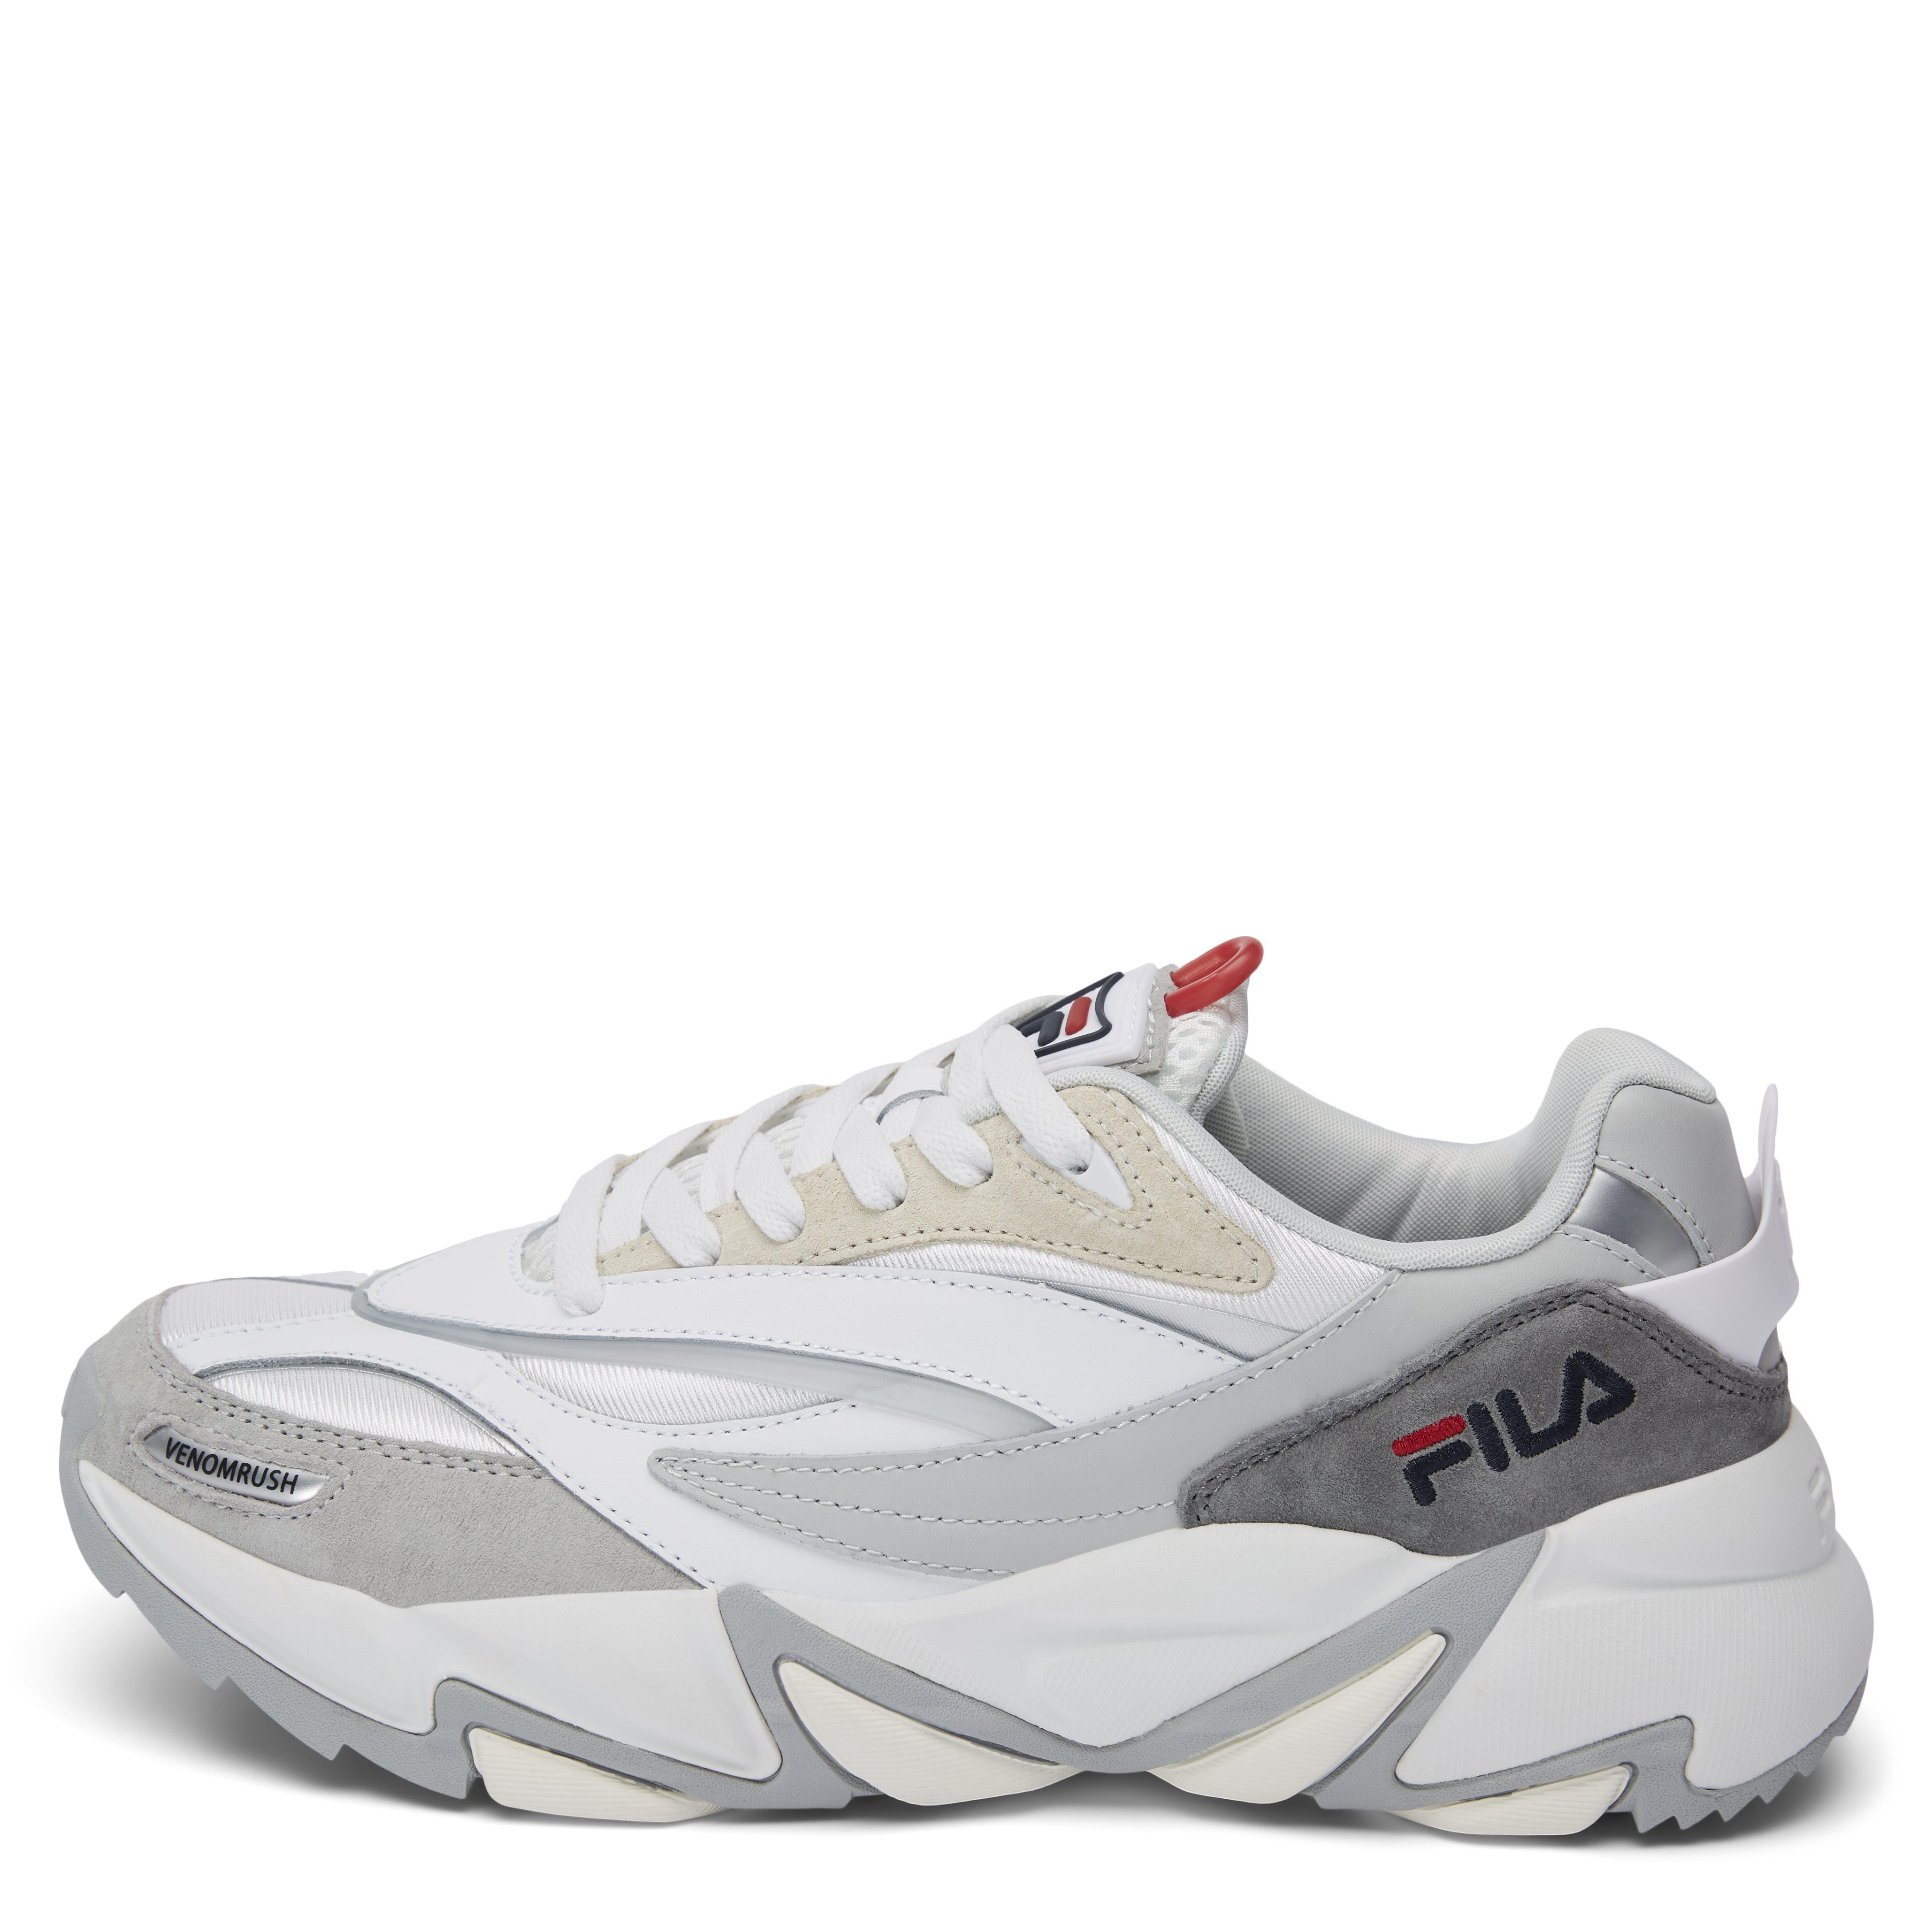 Rush Sneaker - Shoes - White